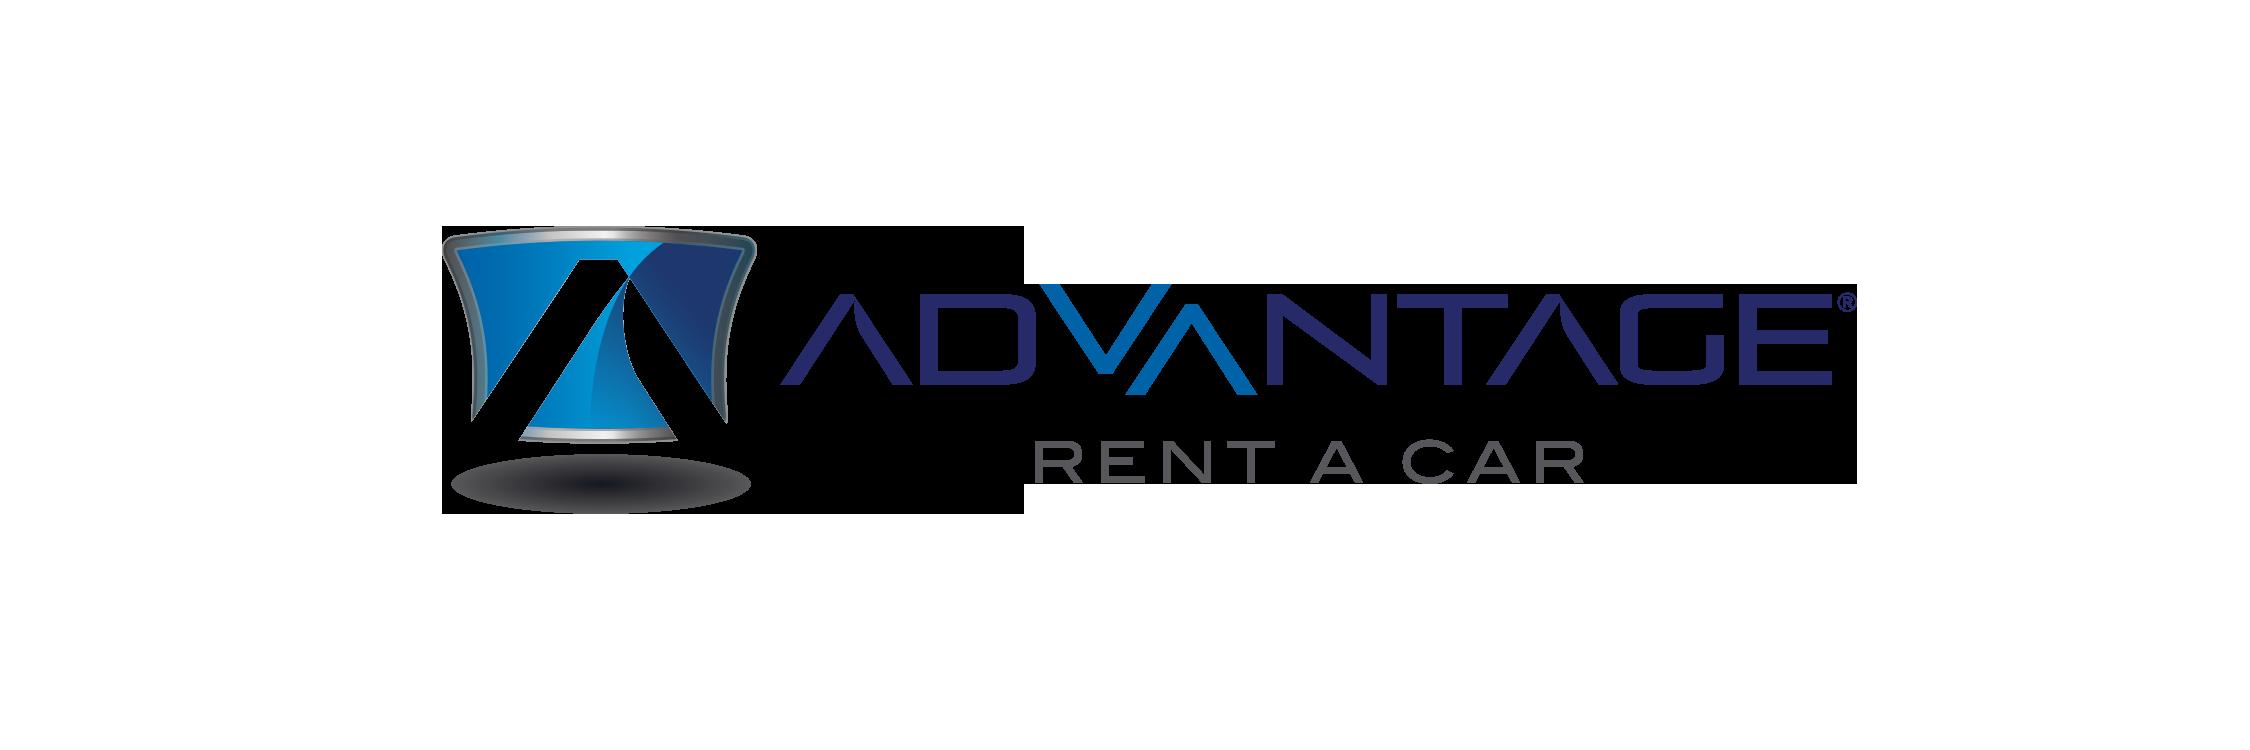 advantage rent a car named first let s get out there travel partner. Black Bedroom Furniture Sets. Home Design Ideas